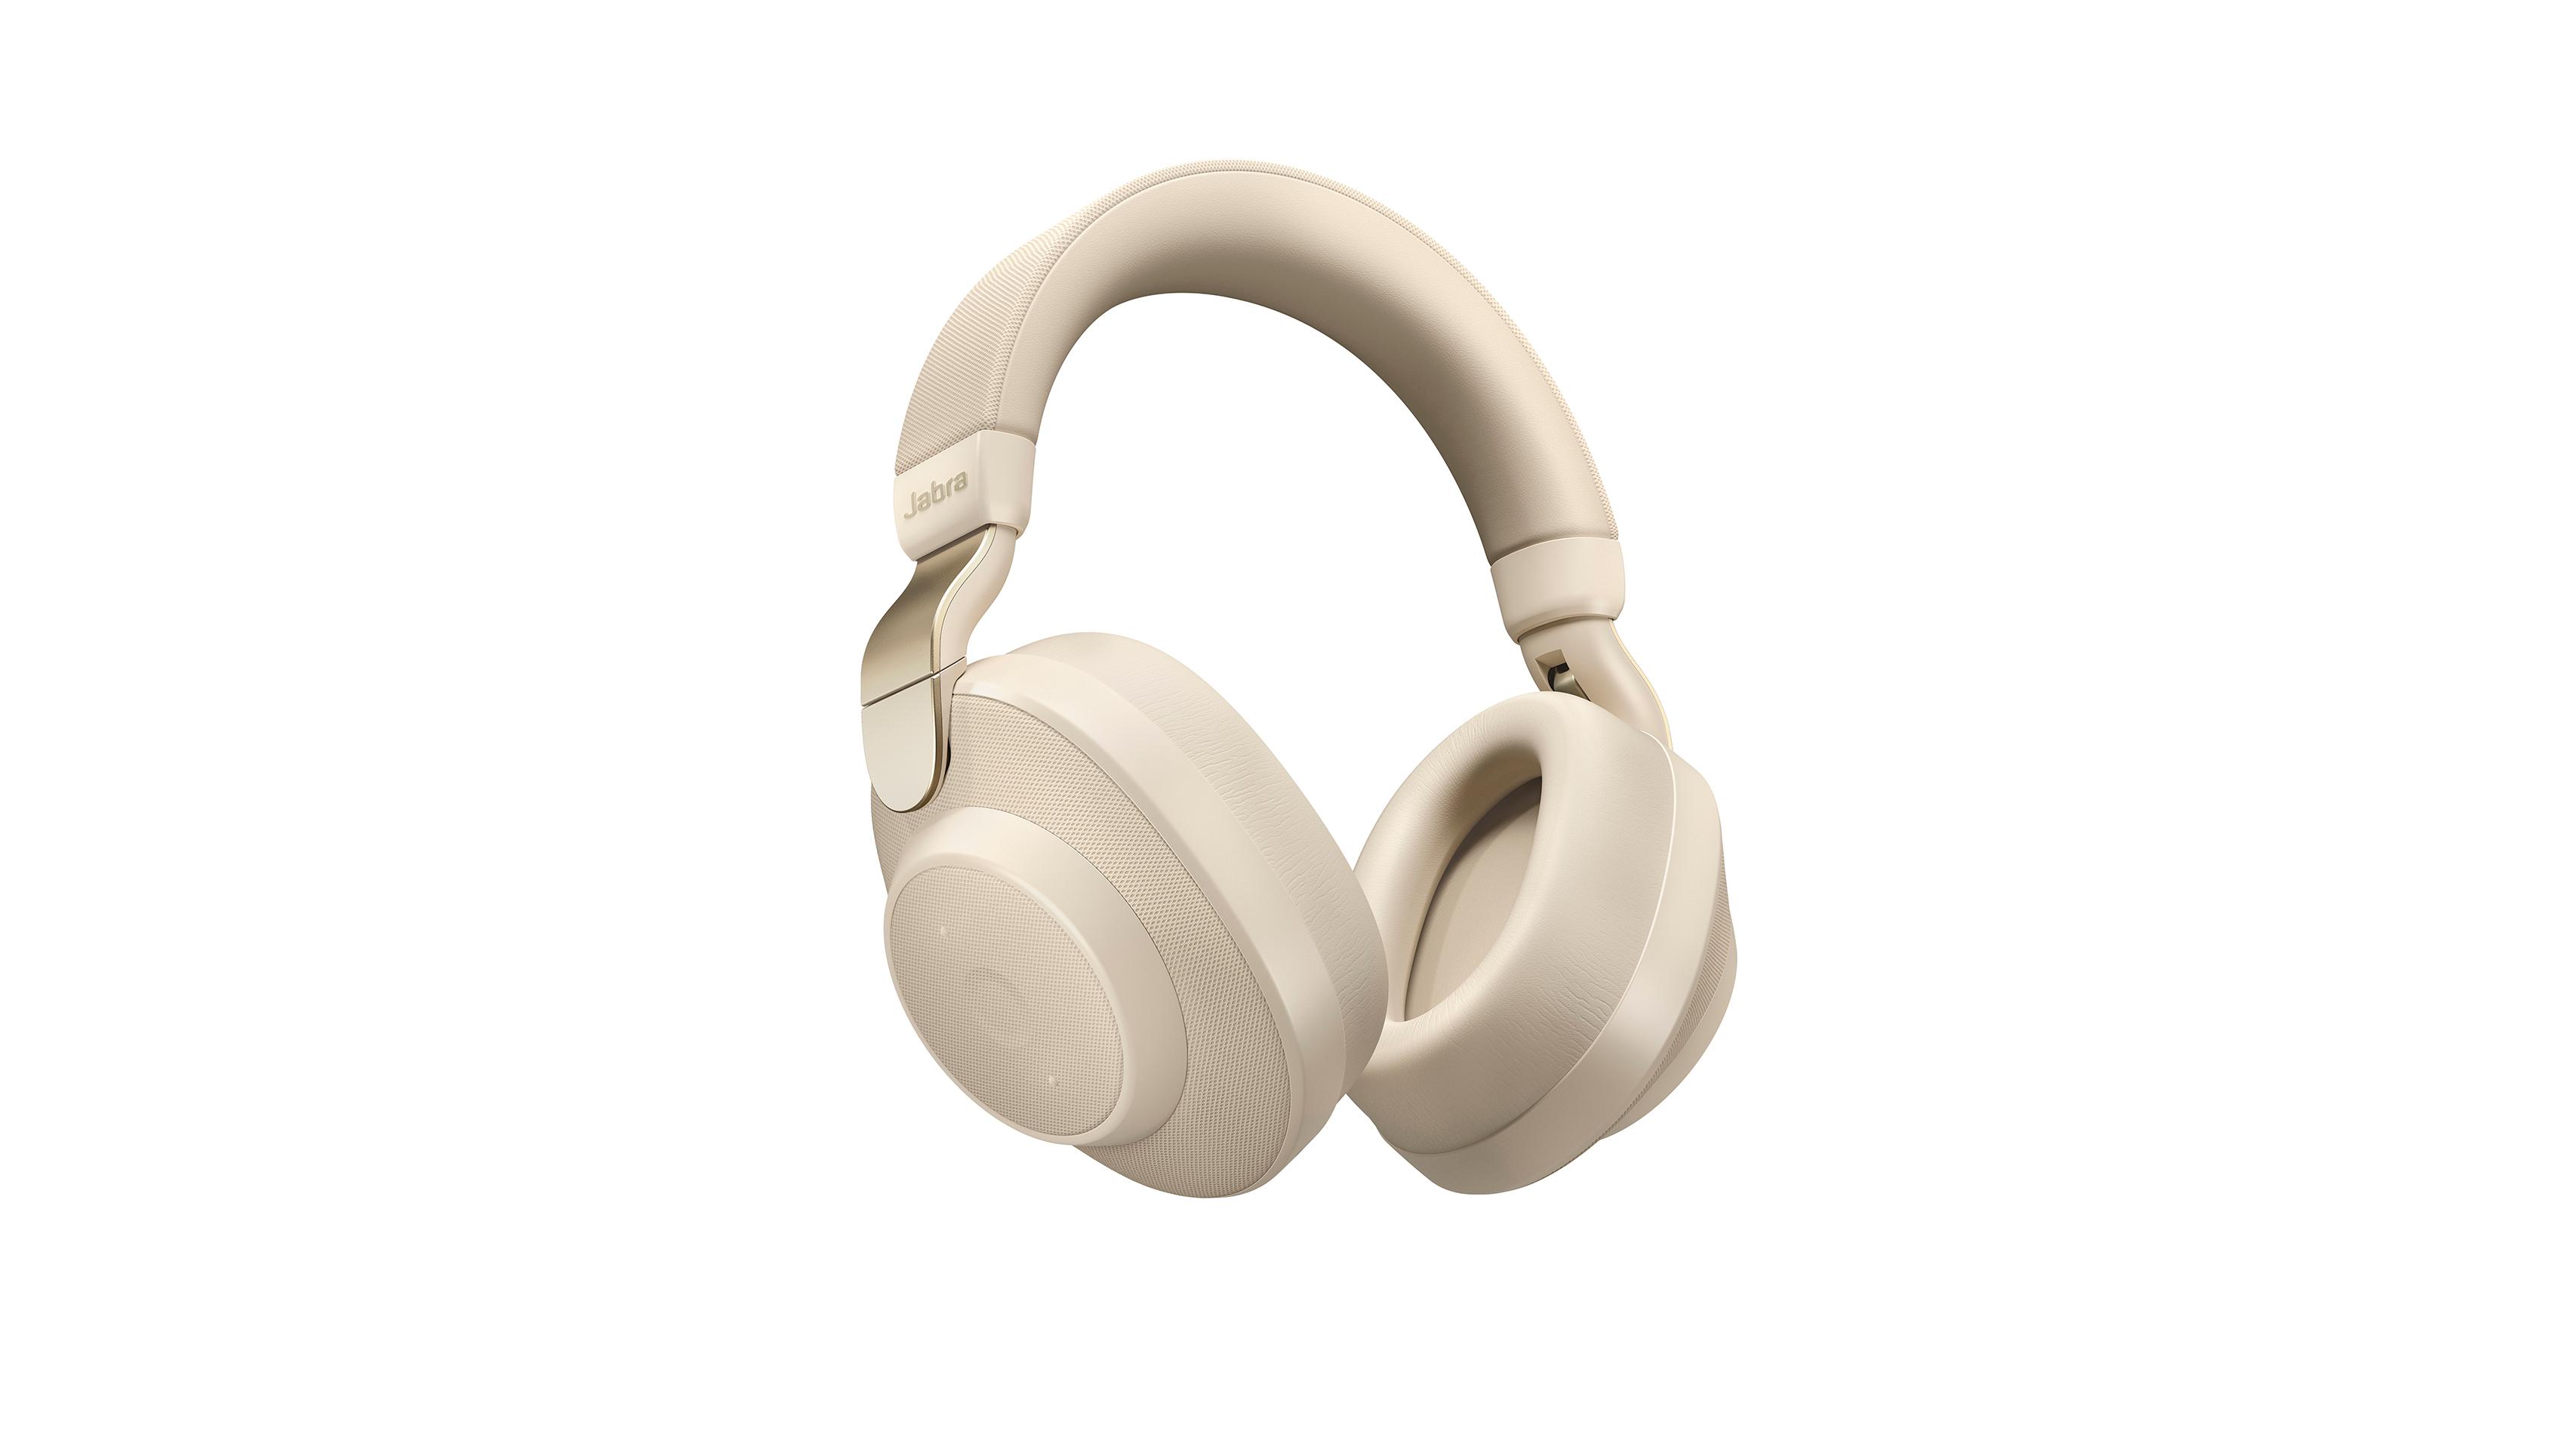 Jabra Elite 85h headphones change sound and invoke Alexa without a single touch